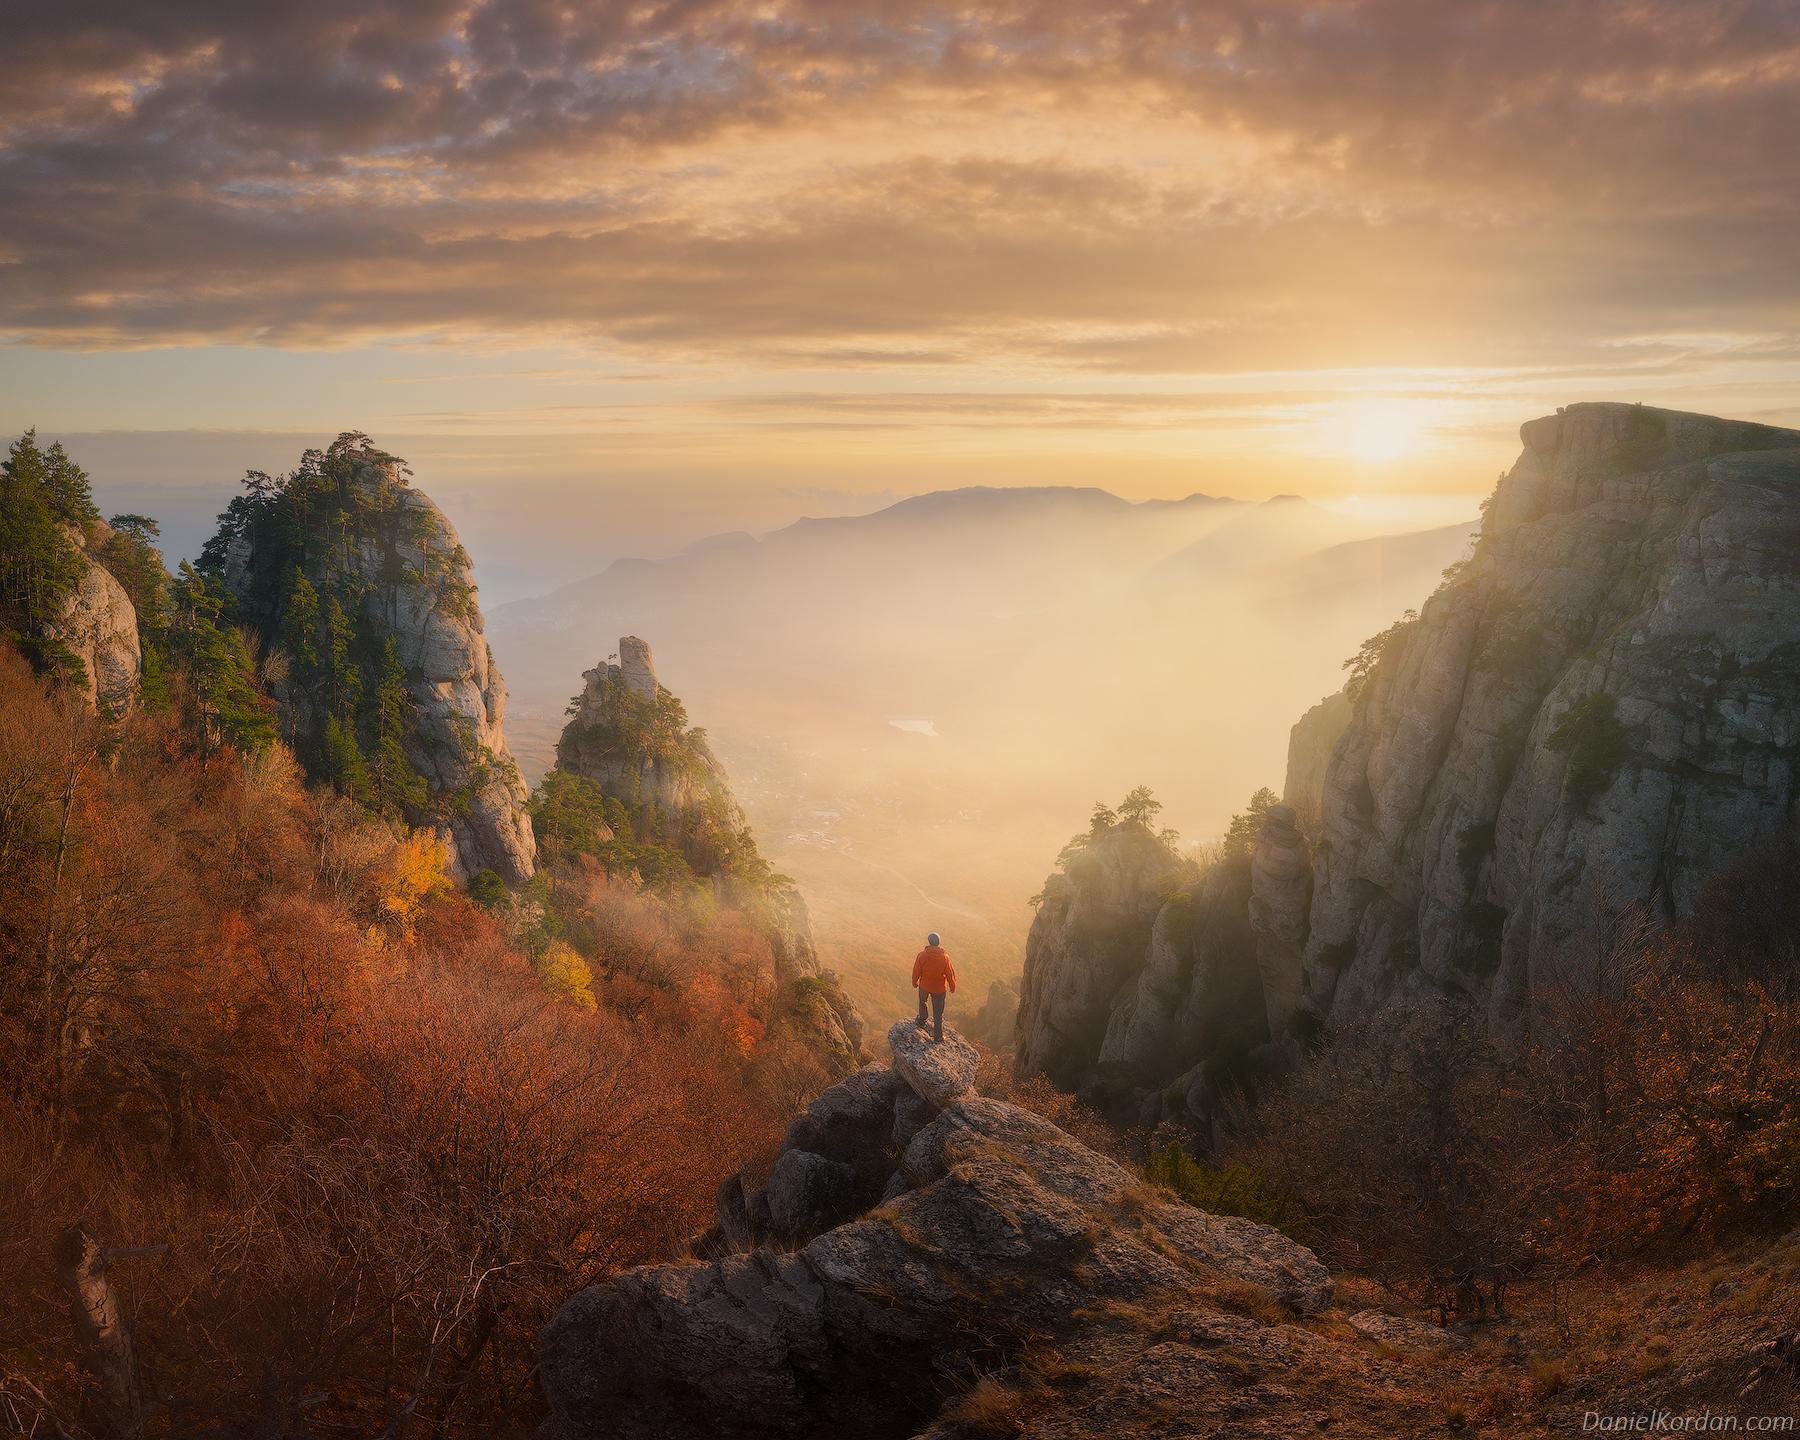 General 1800x1440 Daniel Kordan landscape sky clouds horizon sunlight cliff mountains plants nature